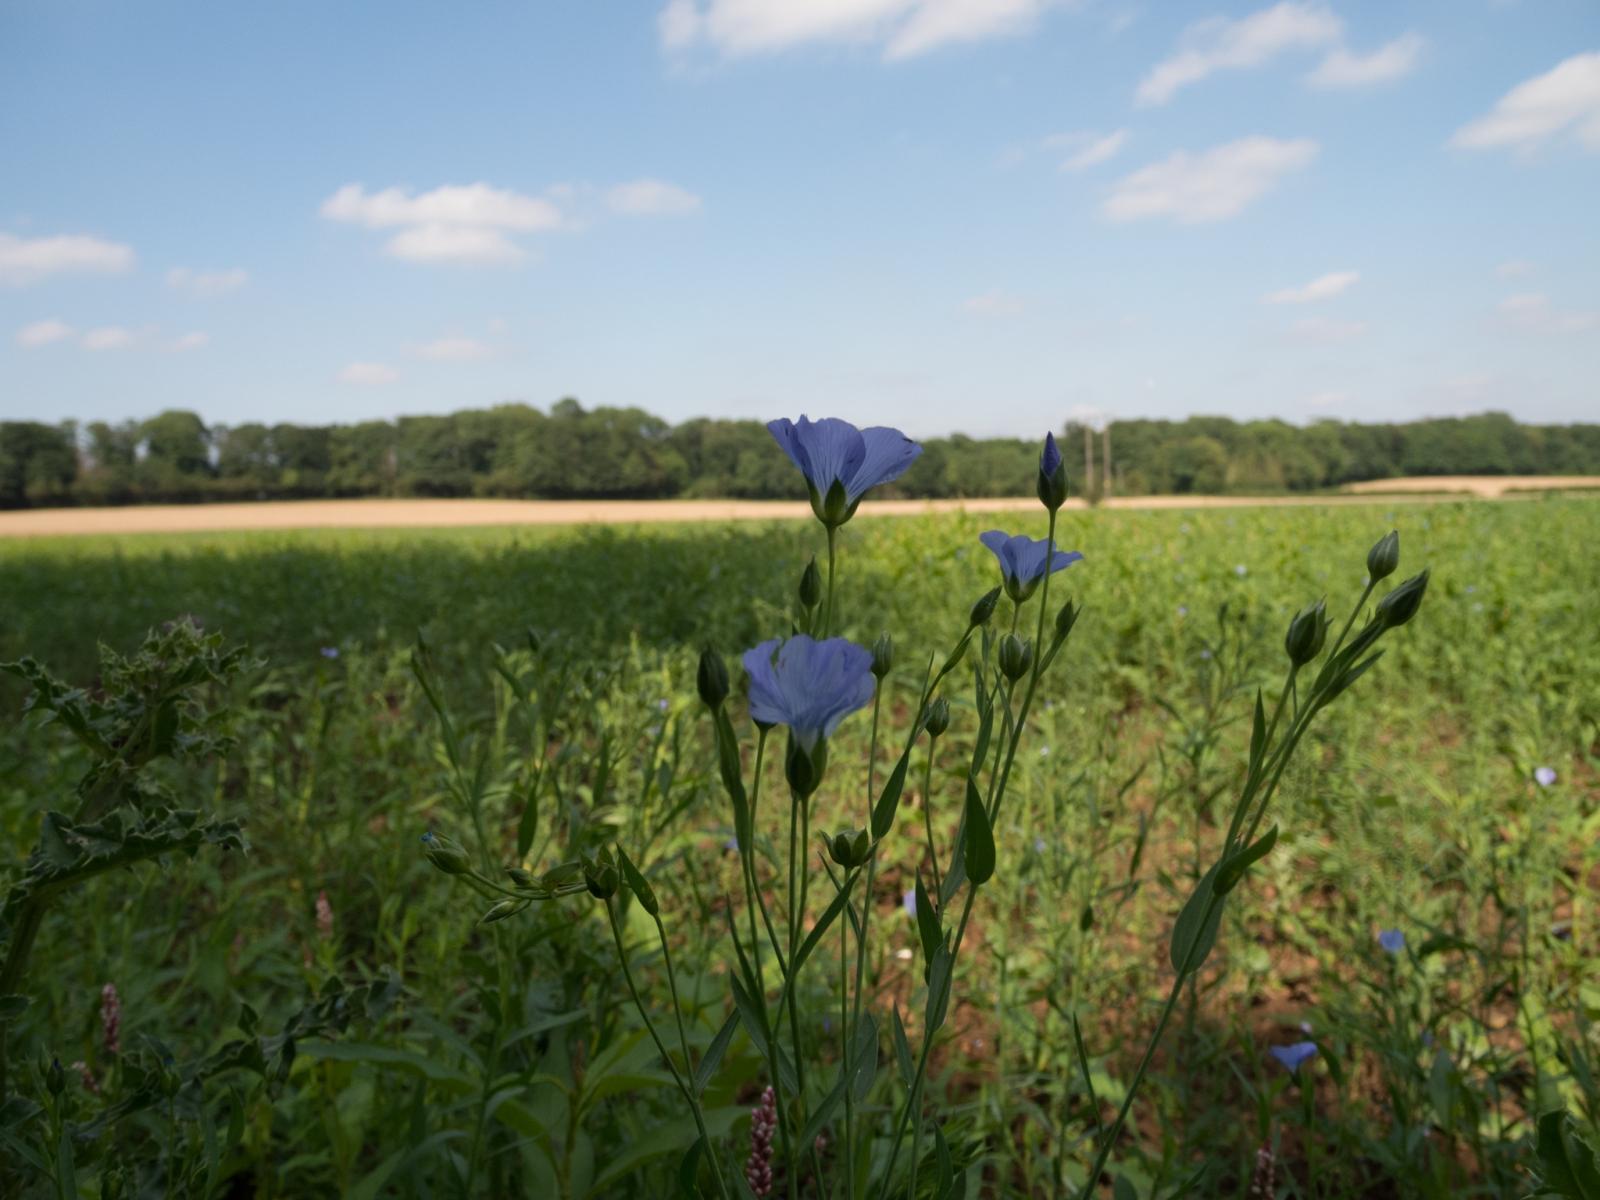 Cultivated Flax (Linum usitatissium), nr Letwell, Yorkshire